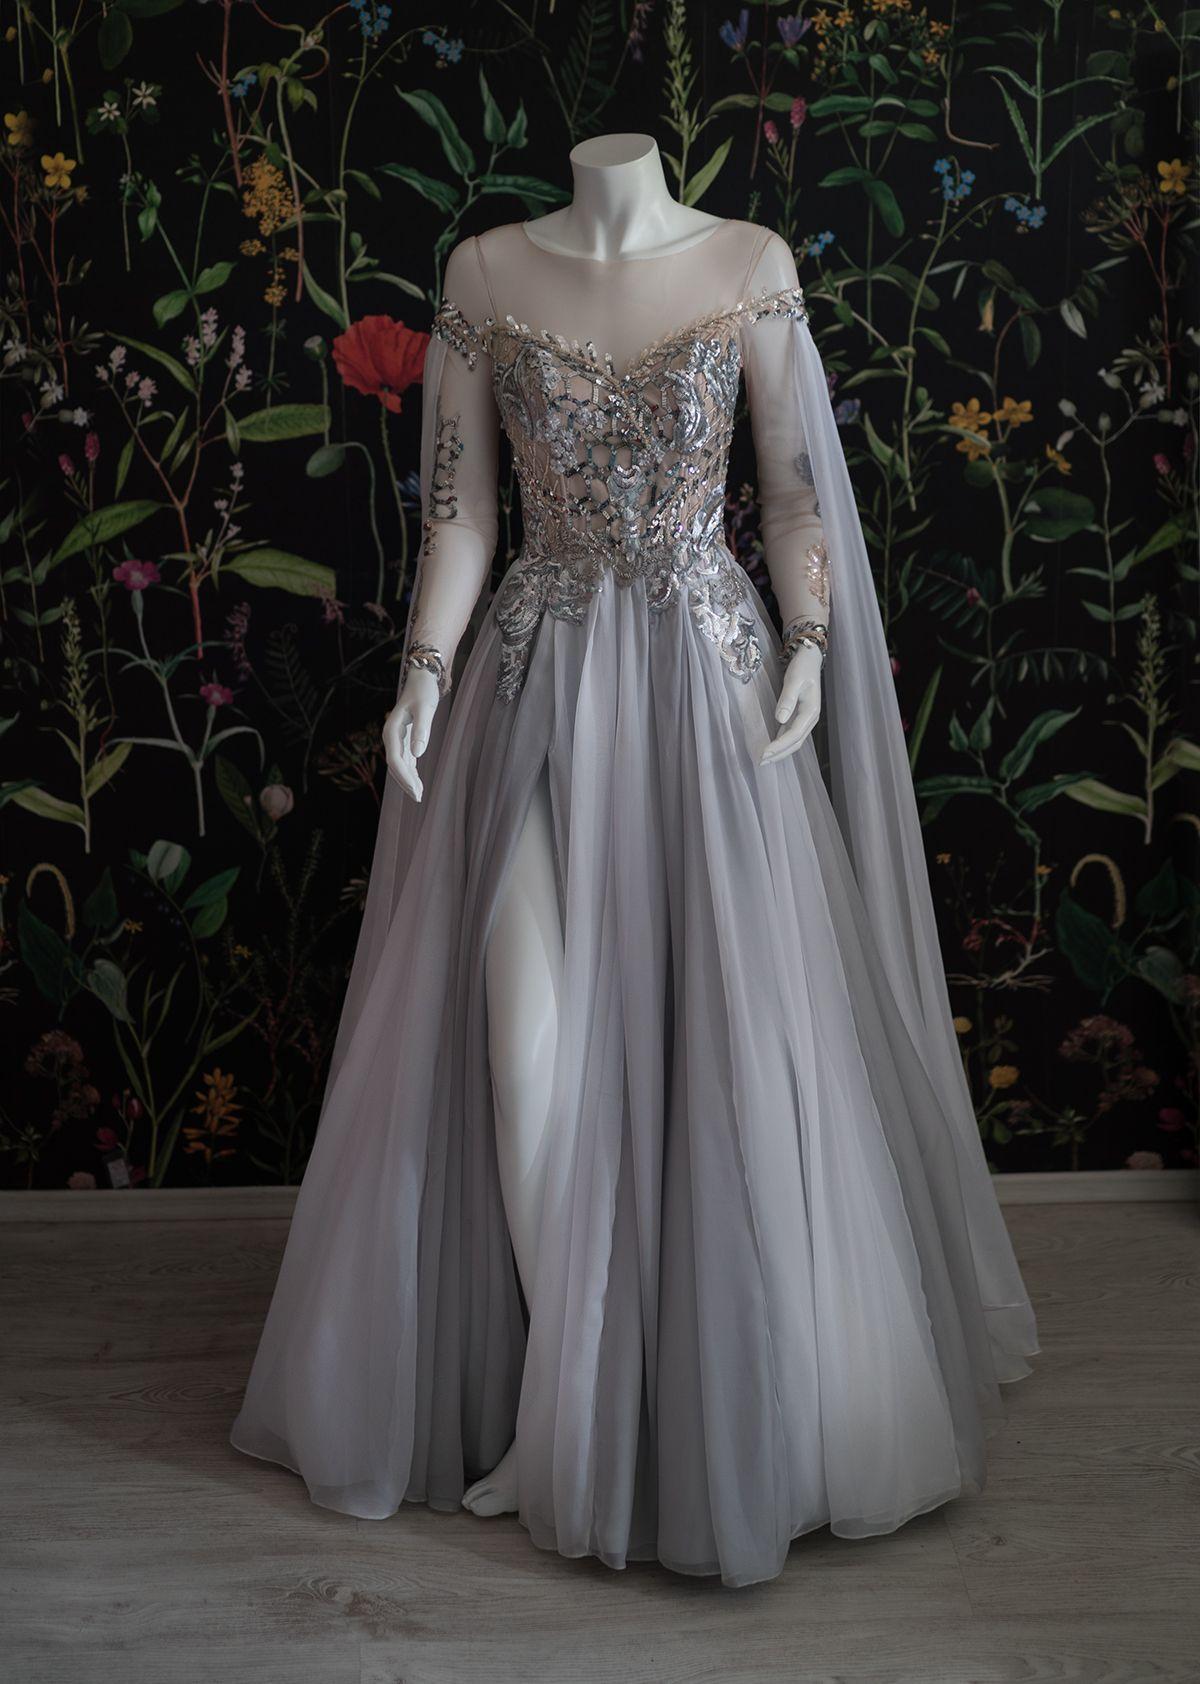 Dsc00556 Ethereal Dress Fantasy Gowns Dresses